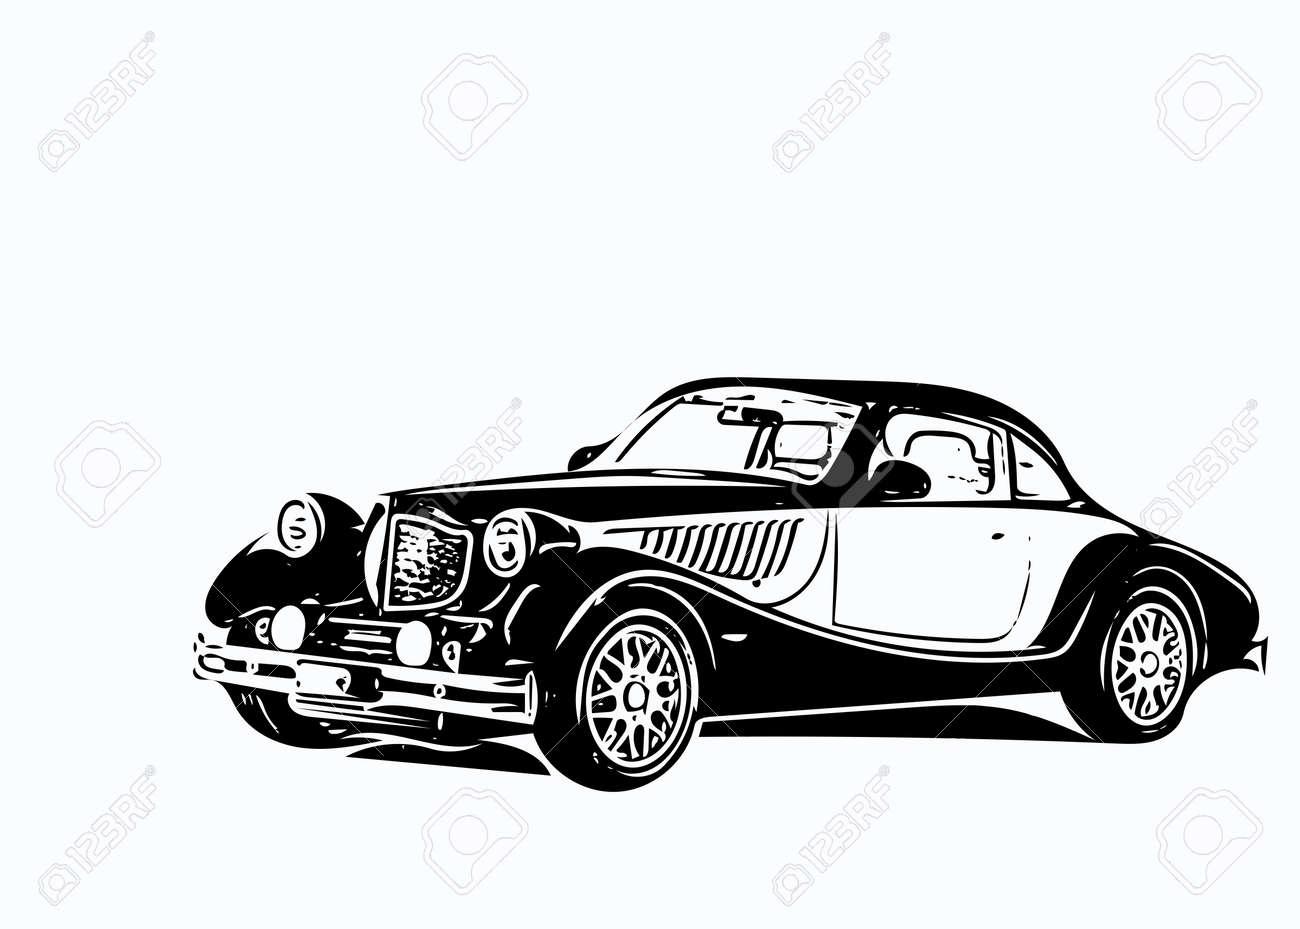 Old car bodysuit black and white illustration. - 167571522